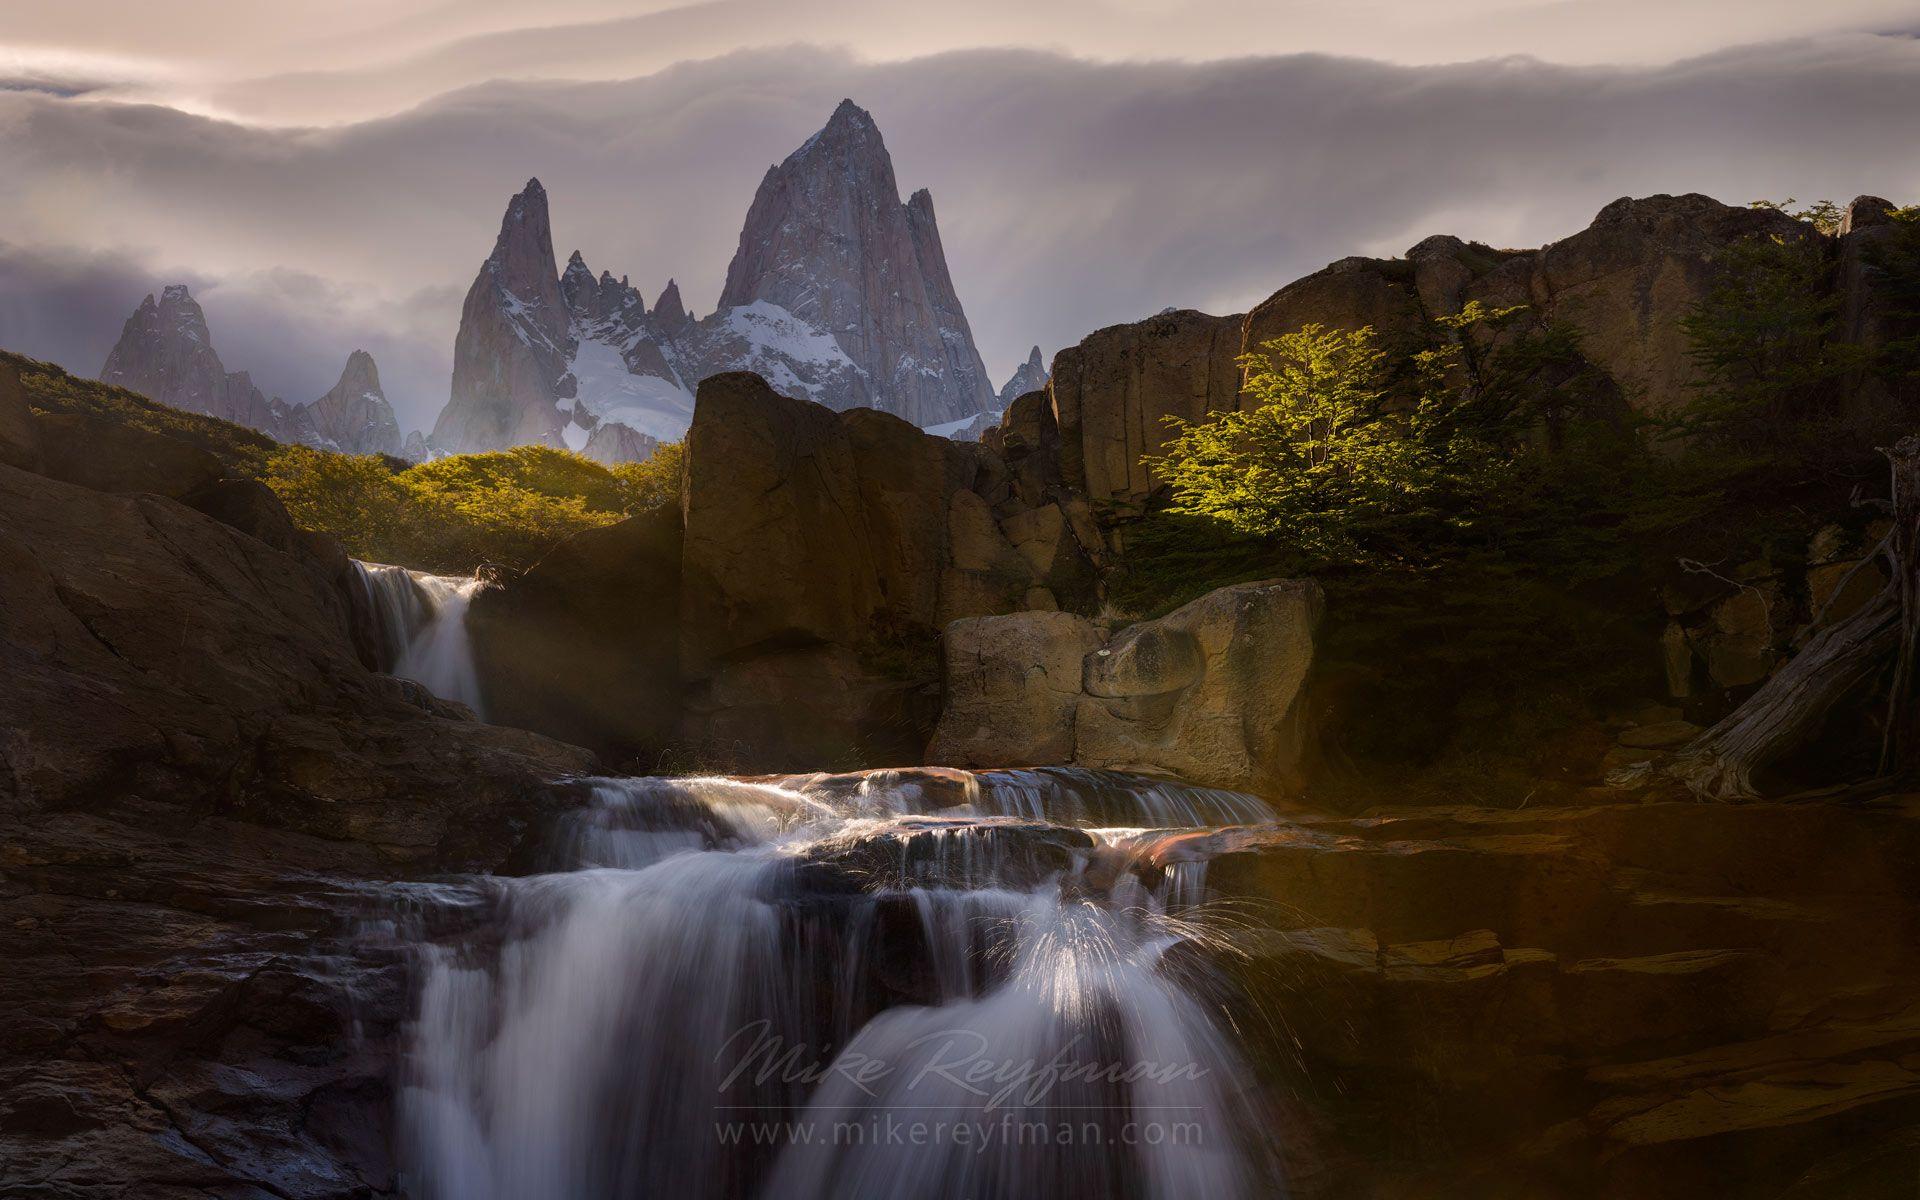 Light & Water Show. Waterfall on the Arroyo Del Salto River below Mount Fitzroy. Los Glaciares National Park, Patagonia, Argentina.   - Fitzroy-Cerro-Torre-Perito-Moreno-Patagonia-Argentina - Mike Reyfman Photography